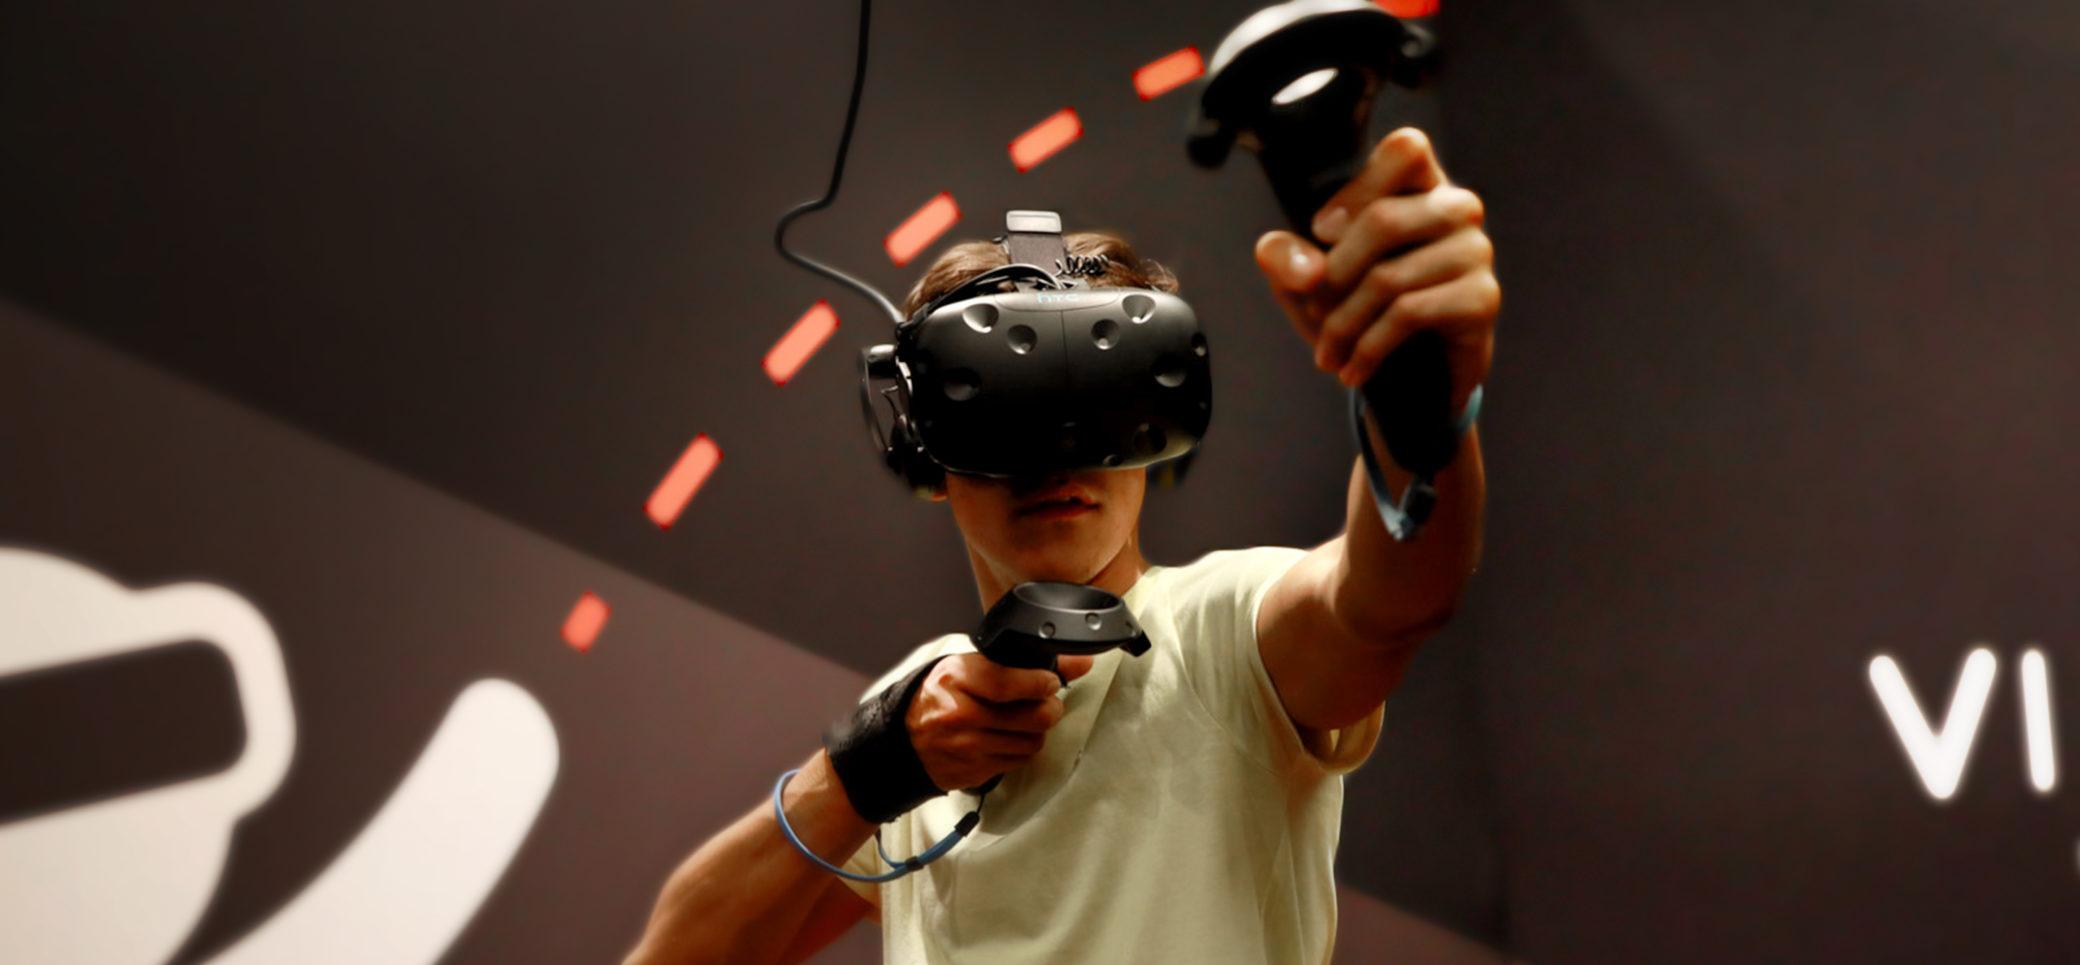 Inside Virtual Room Singapore